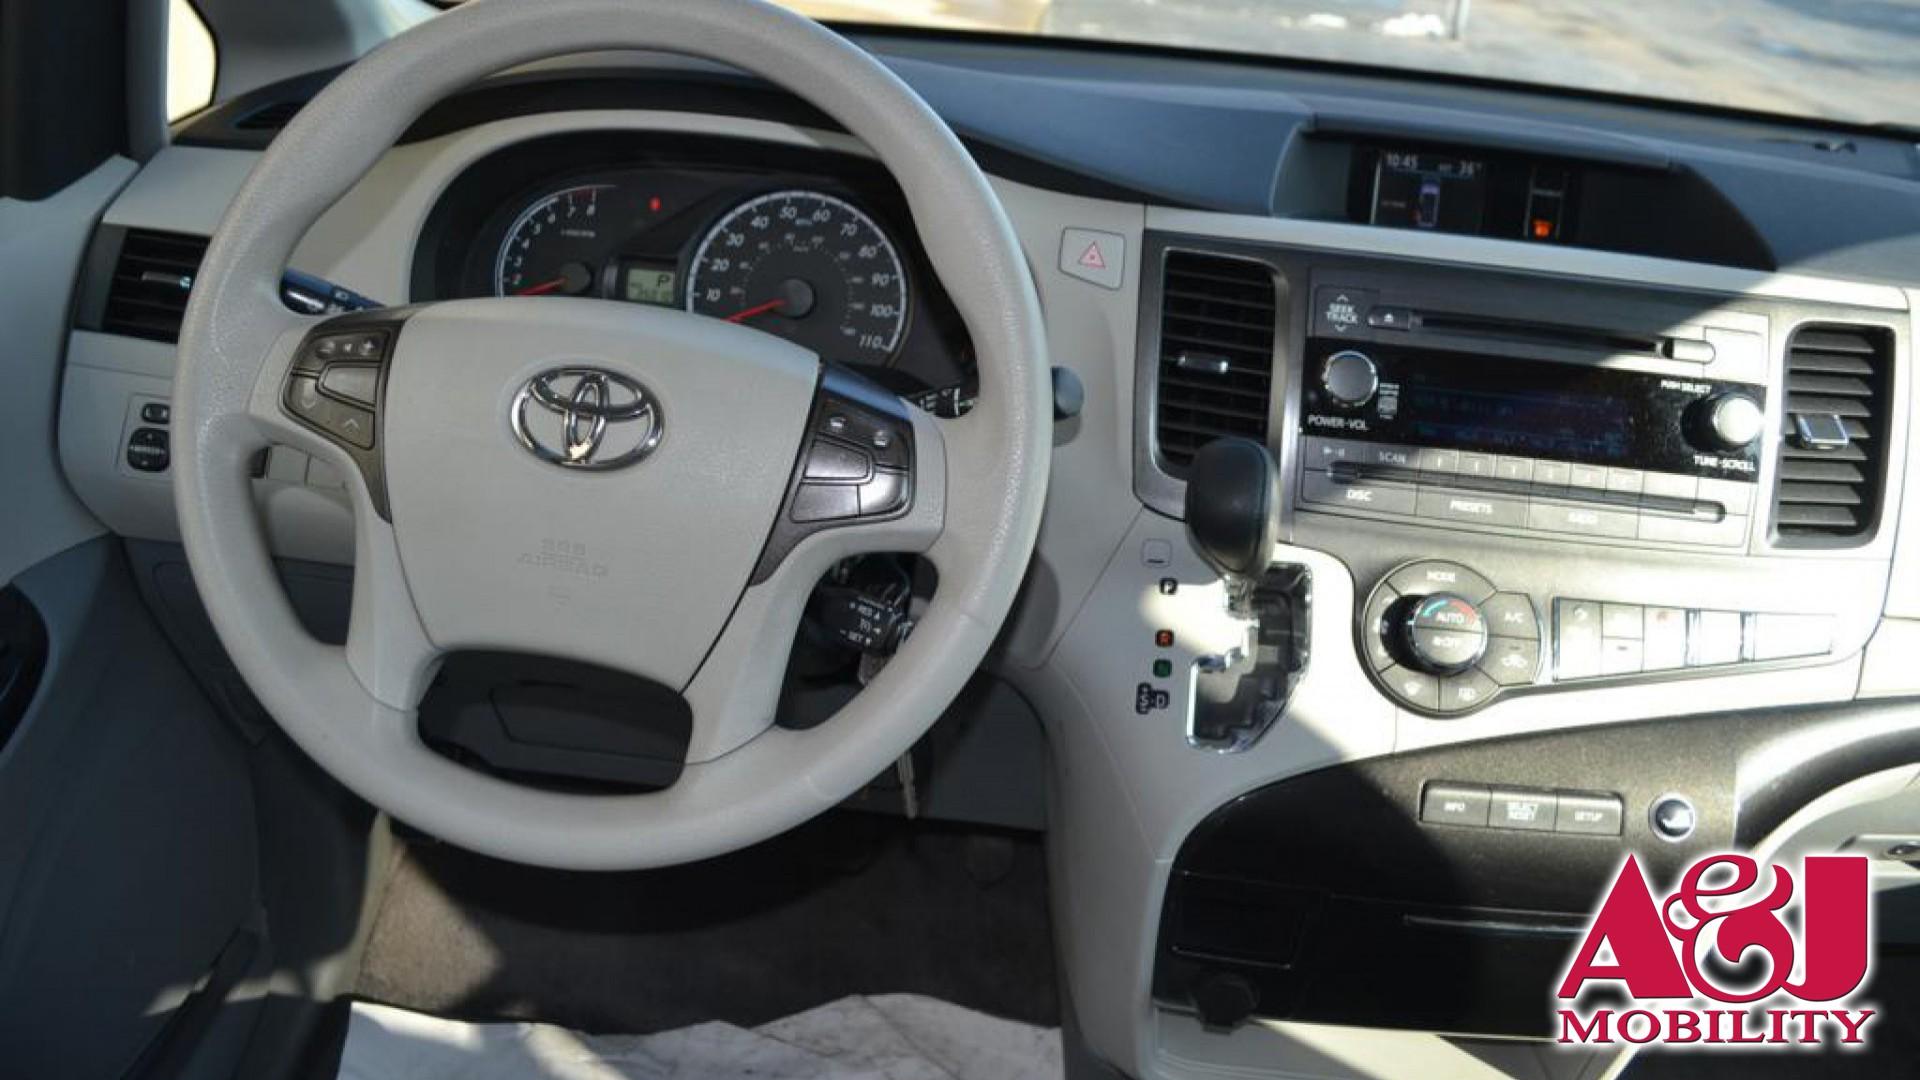 Wheelchair Van For Sale 2013 Toyota Sienna Stock DS